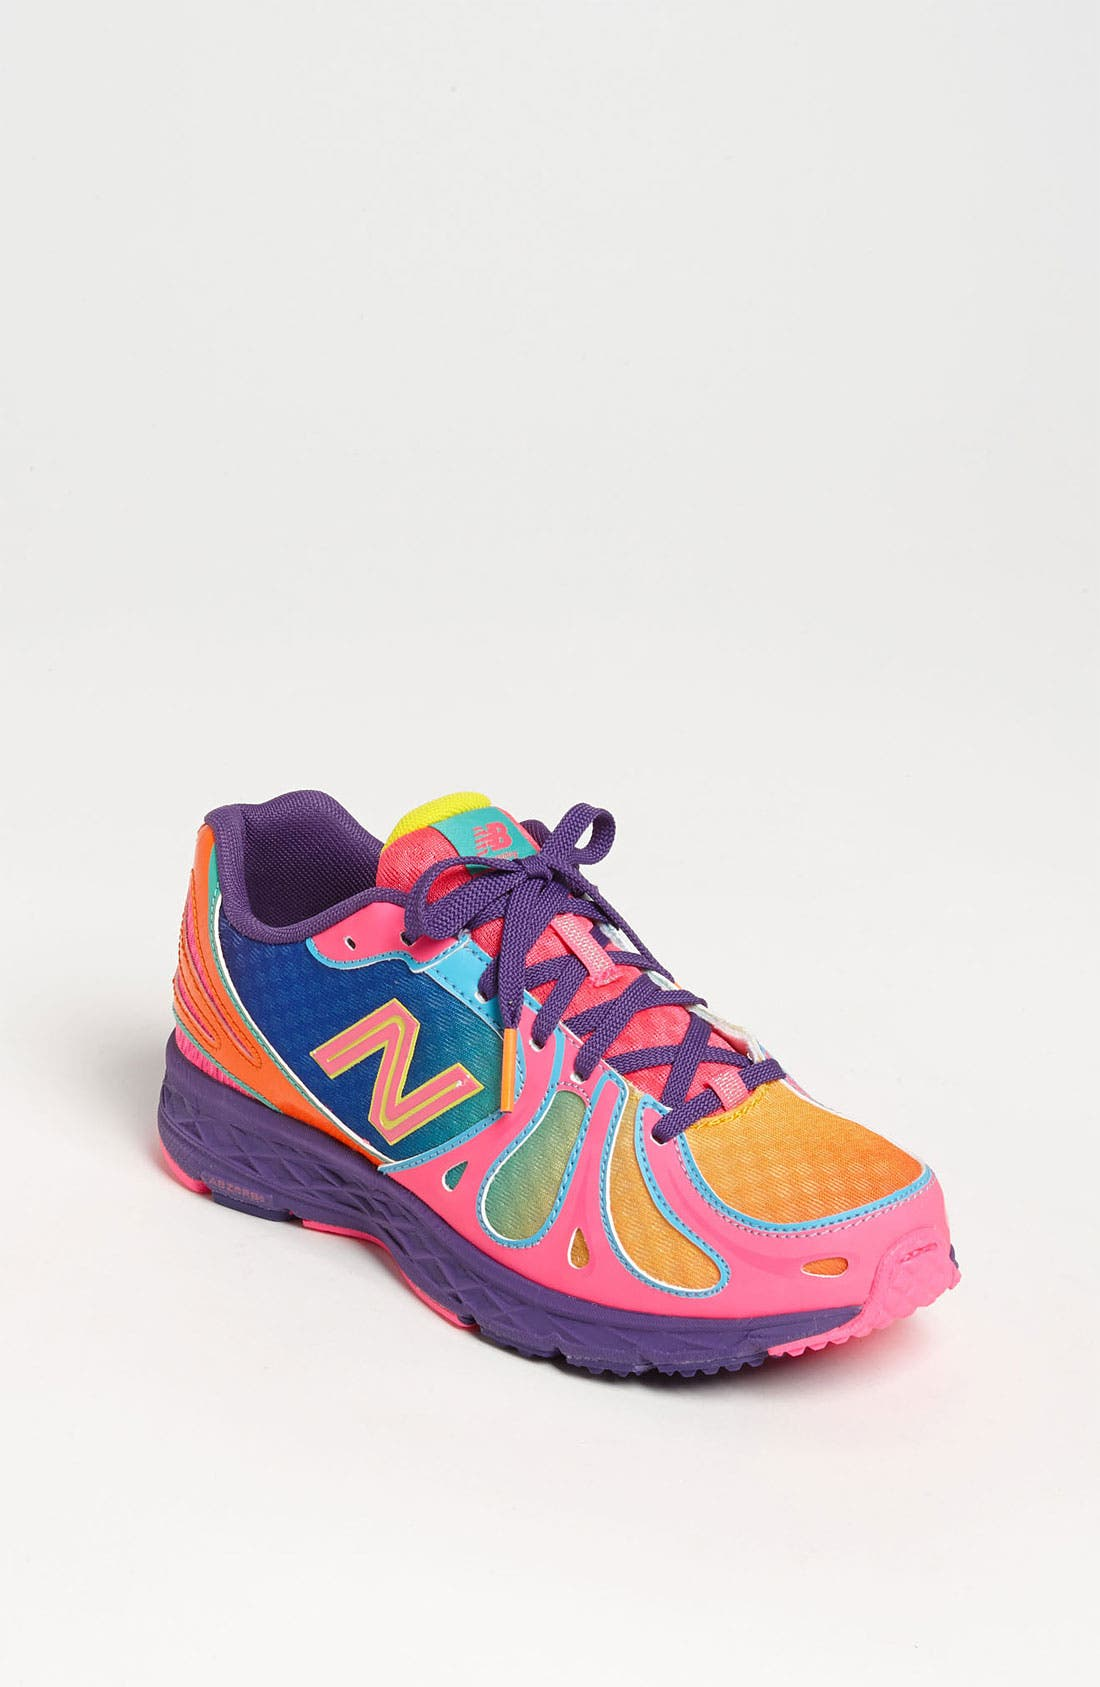 Main Image - New Balance '890' Sneaker (Toddler, Little Kid & Big Kid)